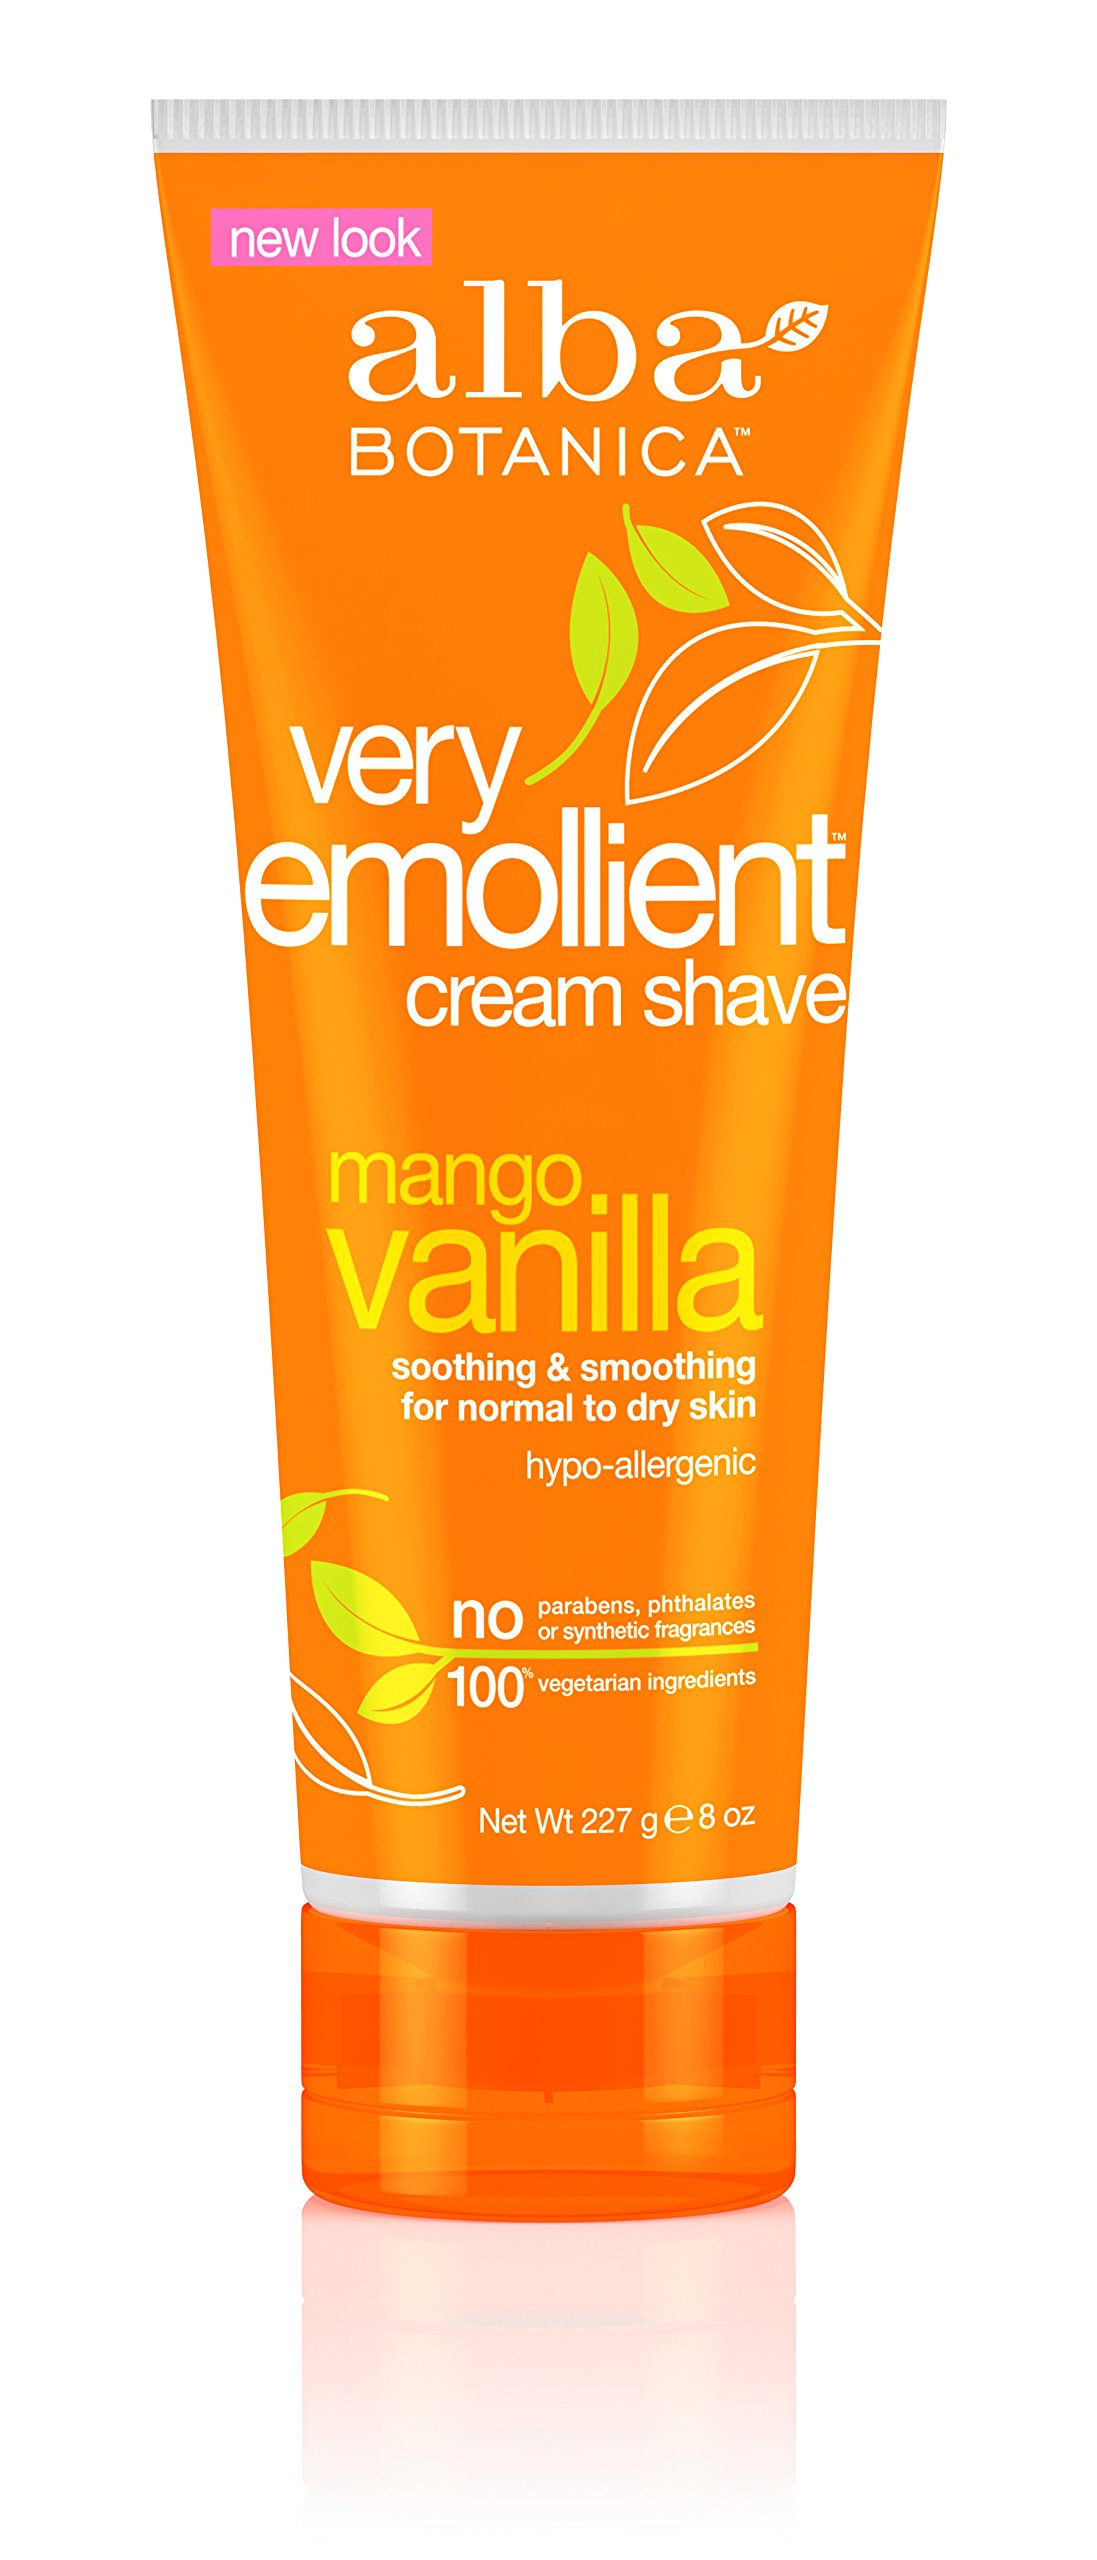 Alba Botanical Mango Vanilla Very Emollient Cream Shave, 8 Ounce Tubes (Pack of 4)